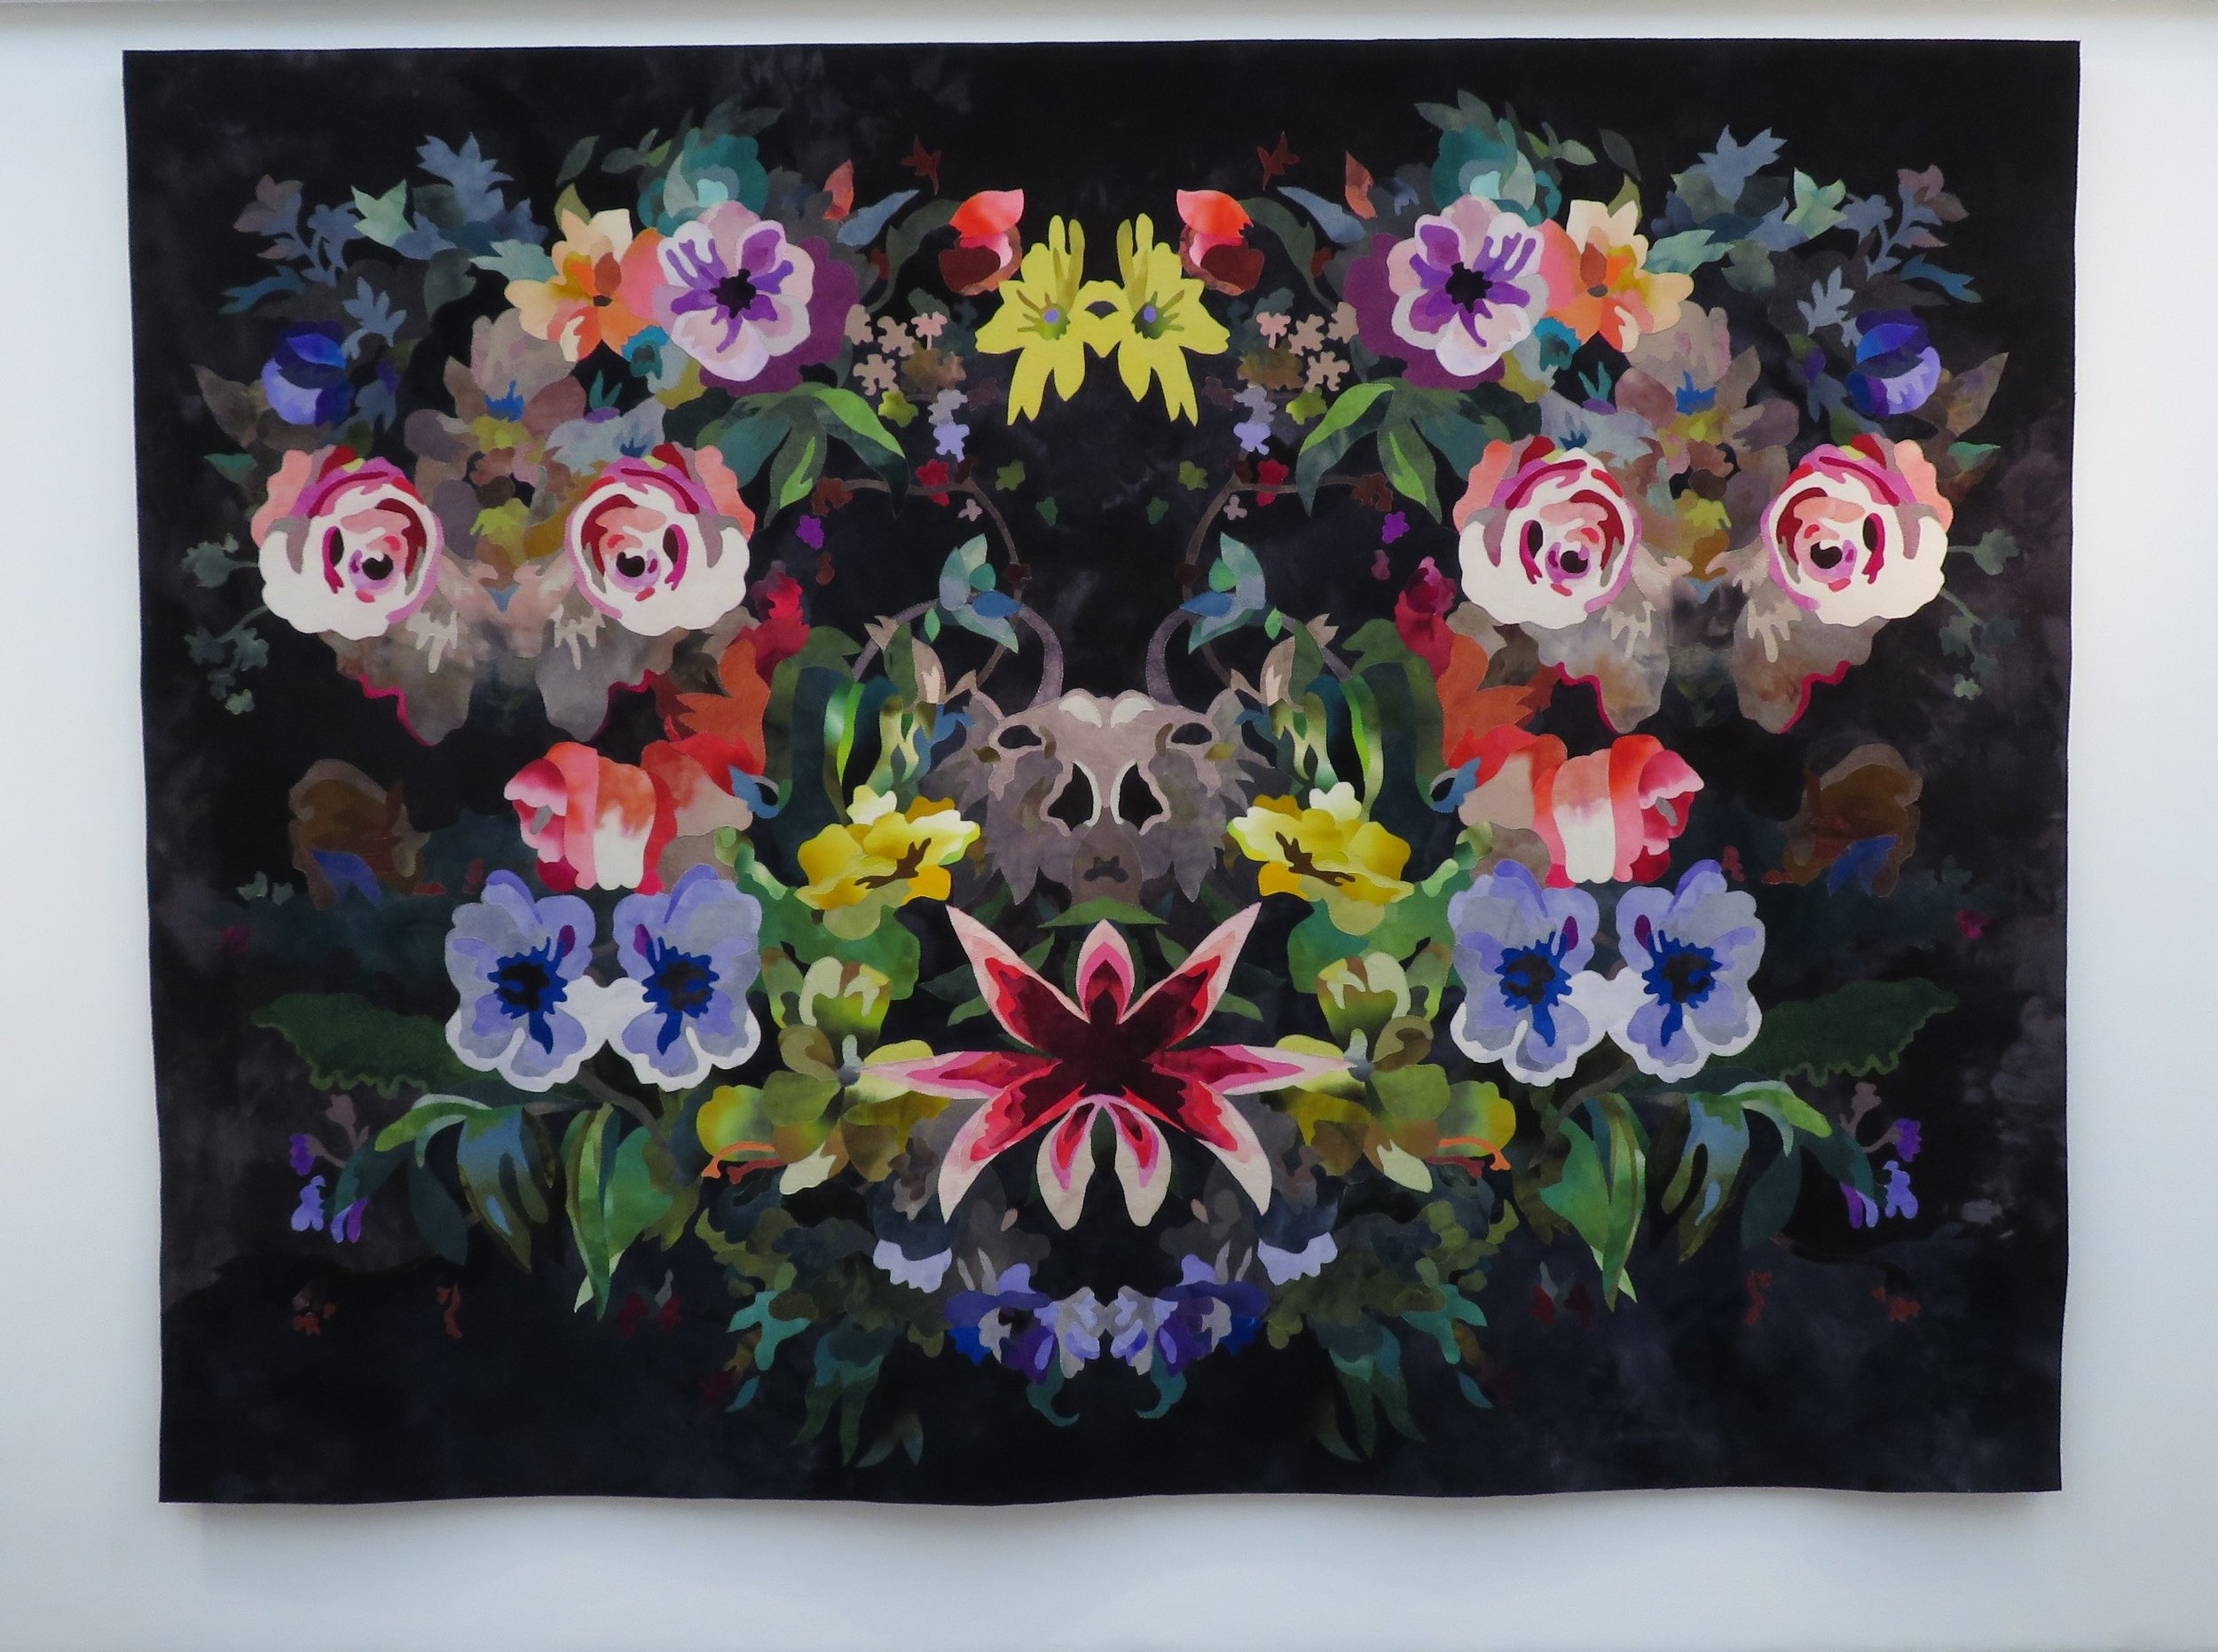 Noe (Something), 2018.    Textile. H. 224 x W. 229 cm.